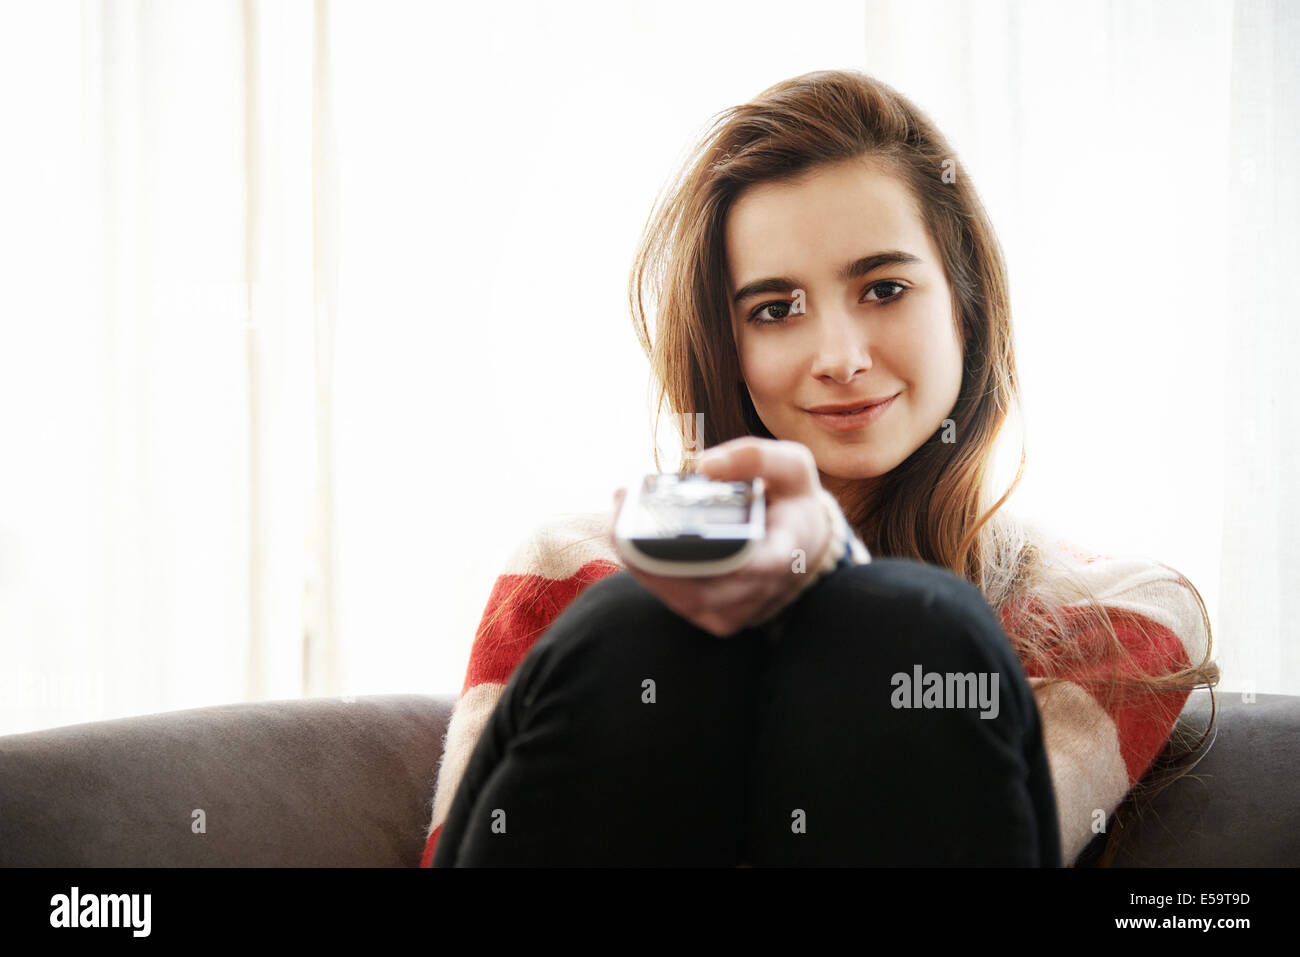 Teenage girl watching television on sofa - Stock Image